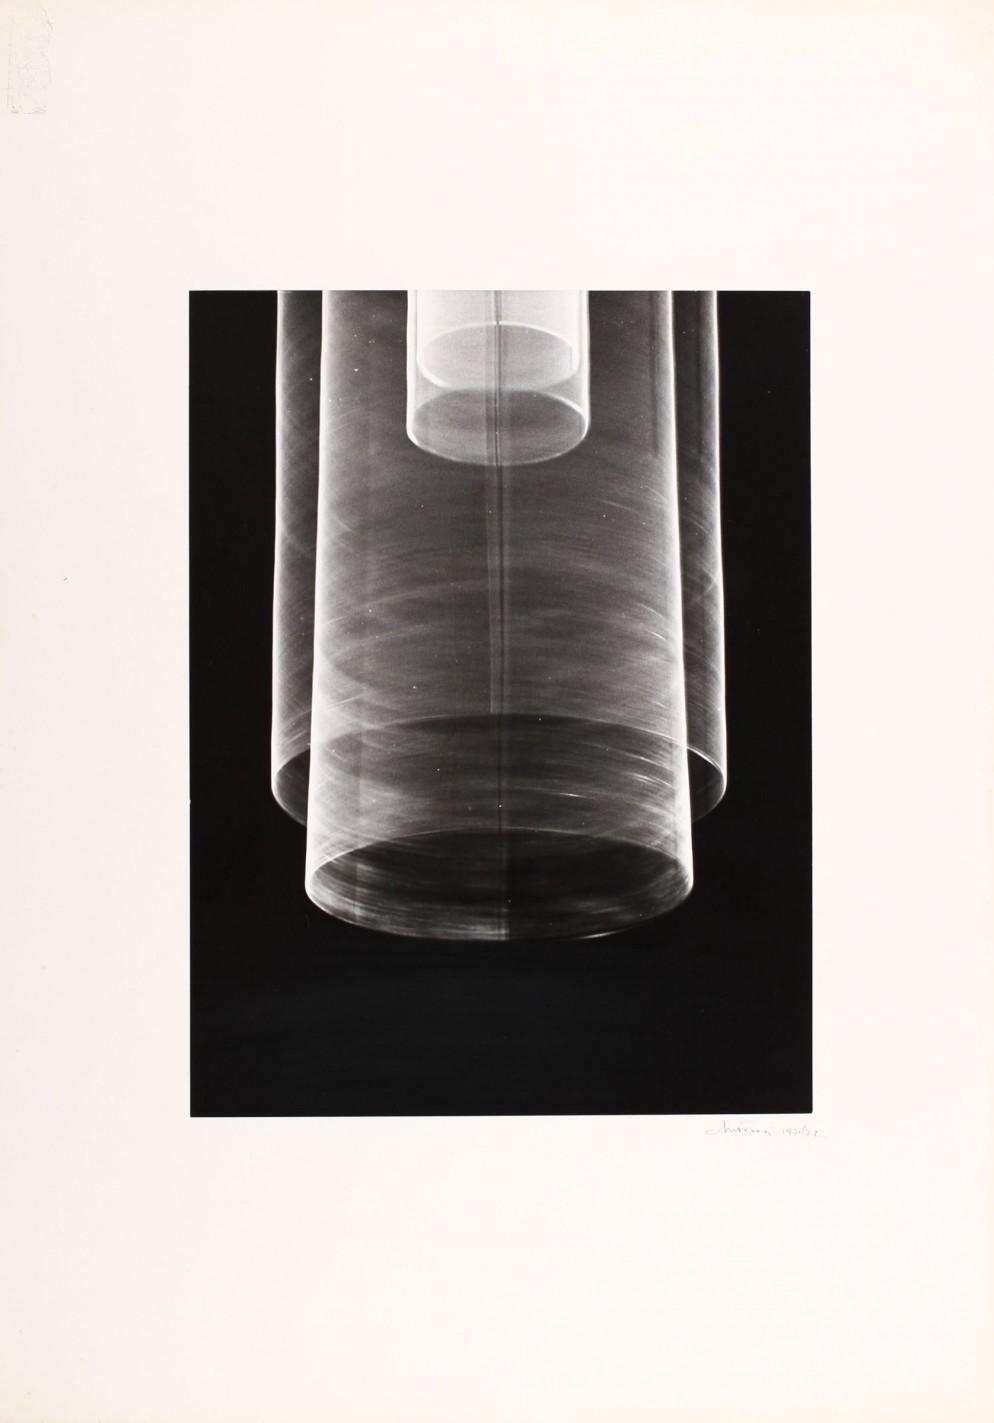 2_Gianfranco Chiavacci, GF2234, 1971. 50 x 70 cm. Courtesy Galleria Die Mauer